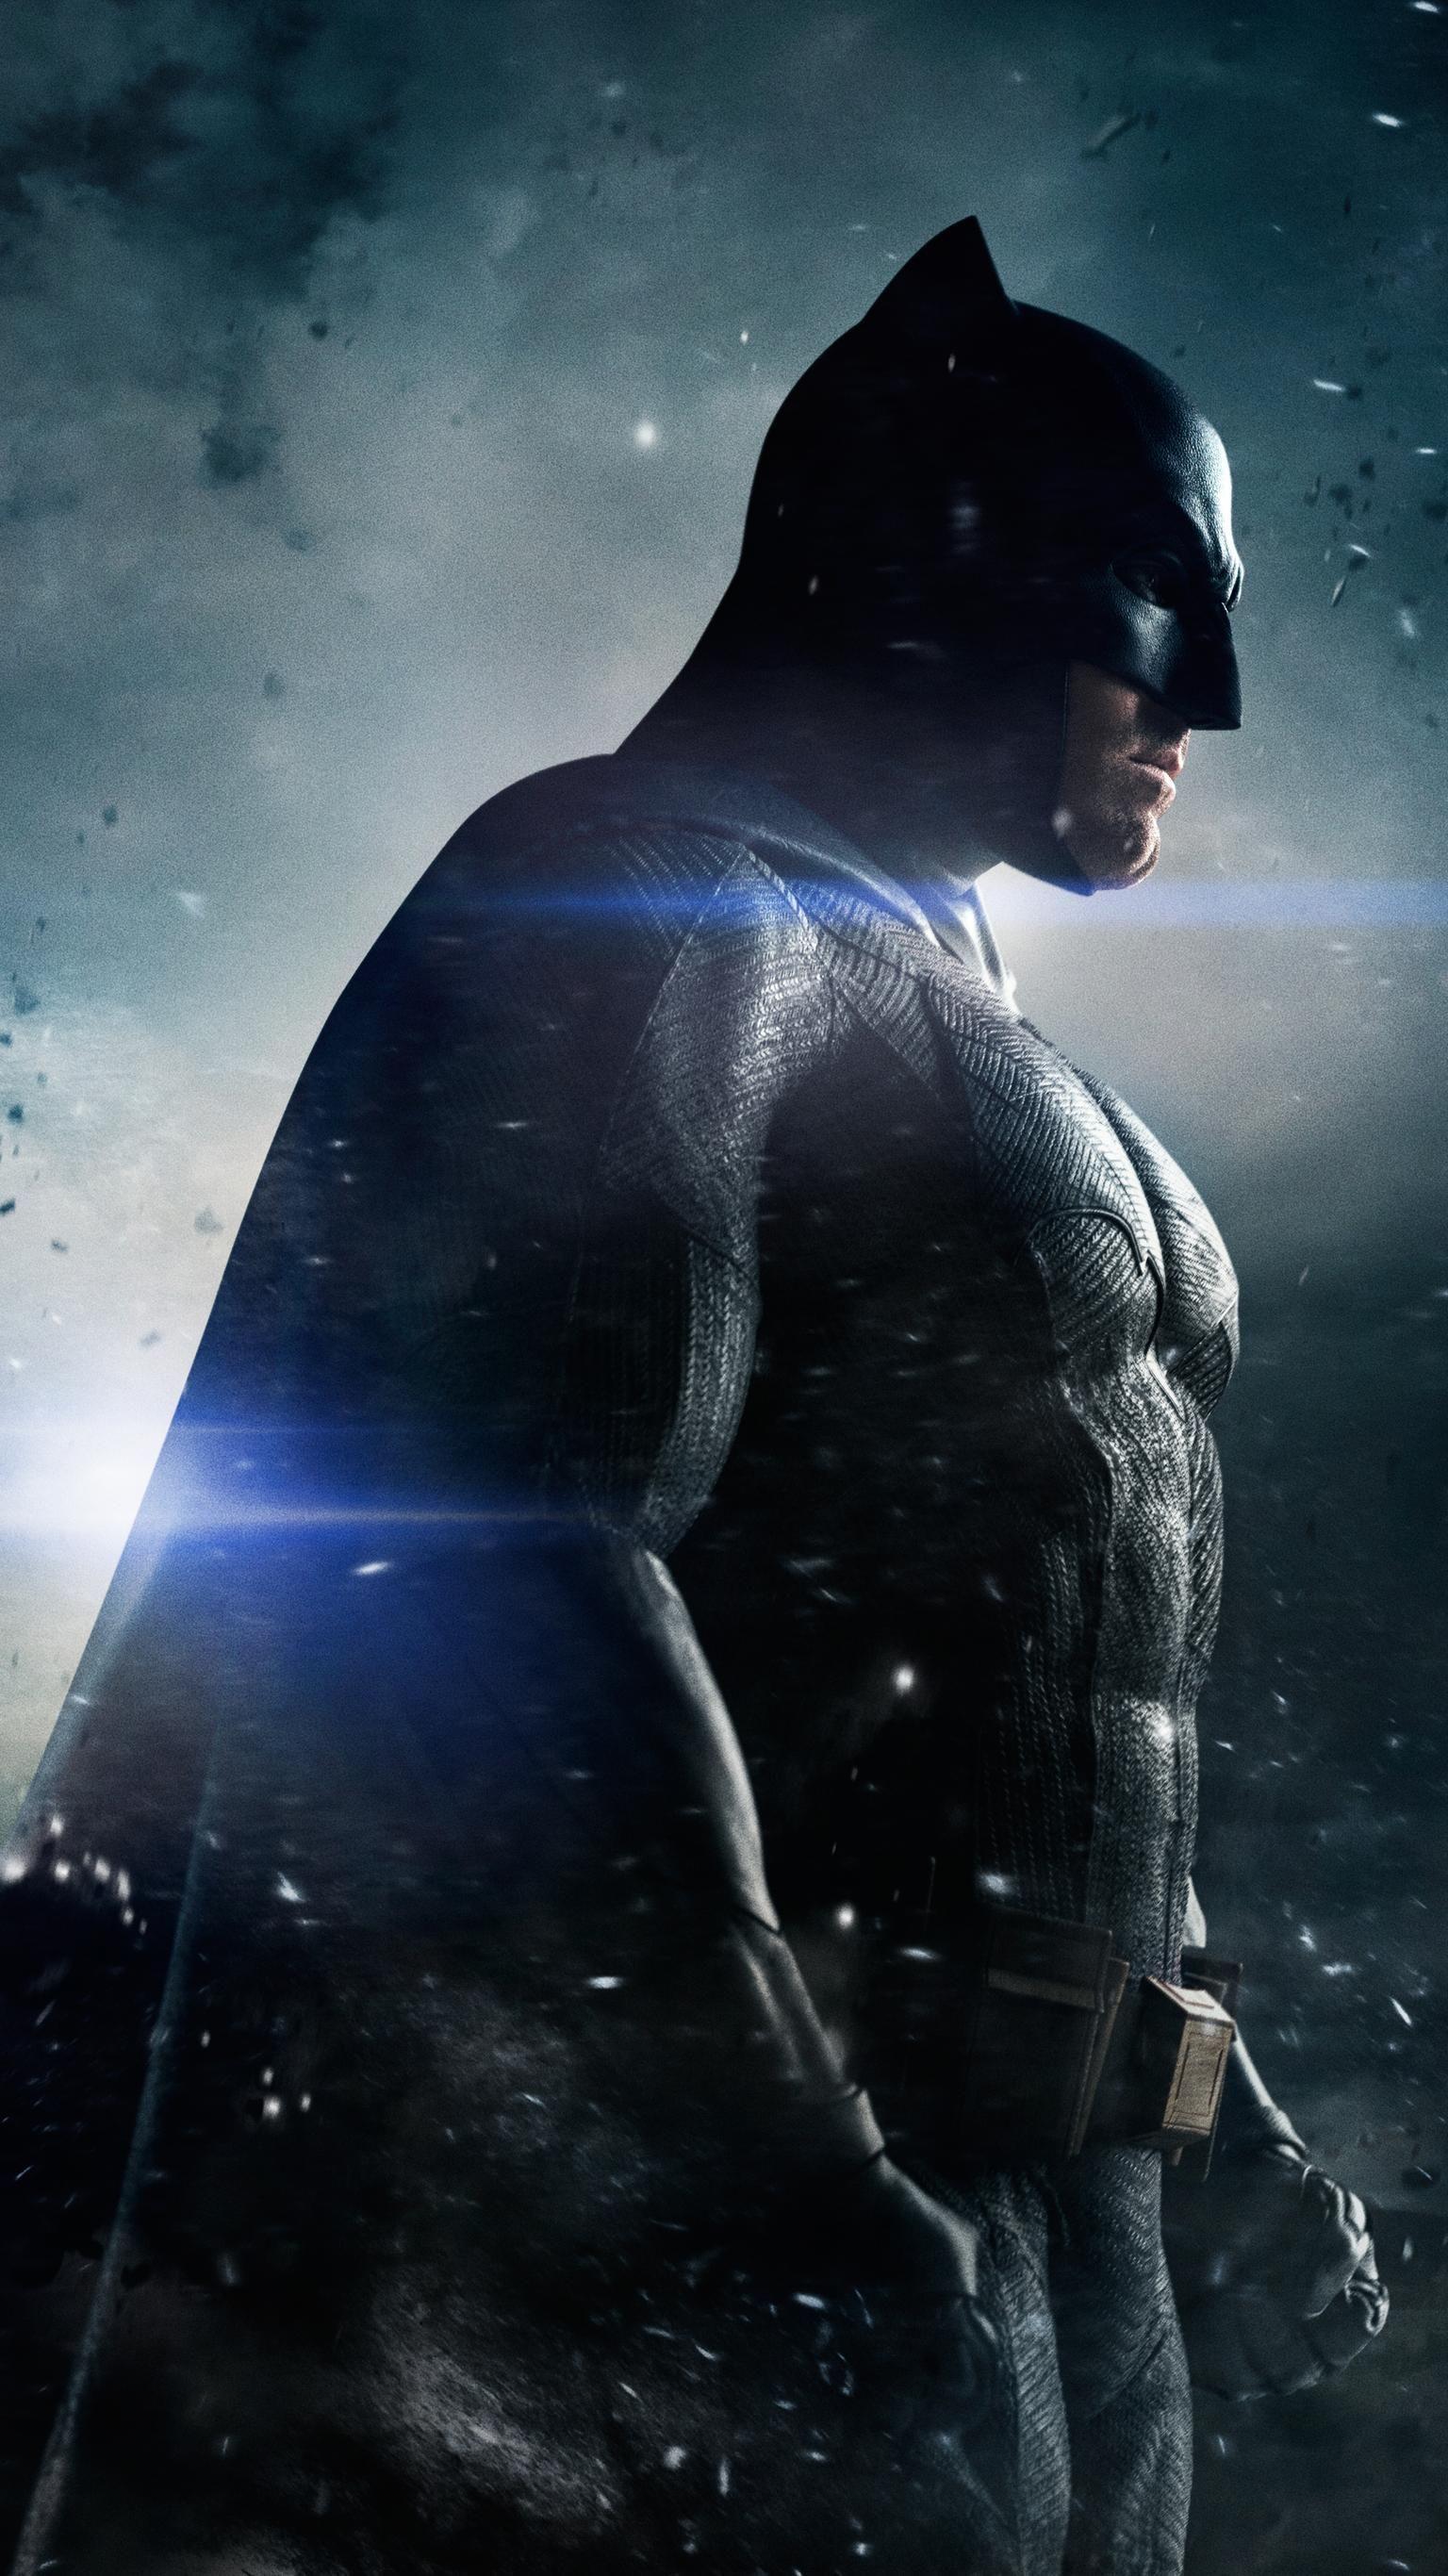 Batman And Superman Wallpaper Background HD Download Free